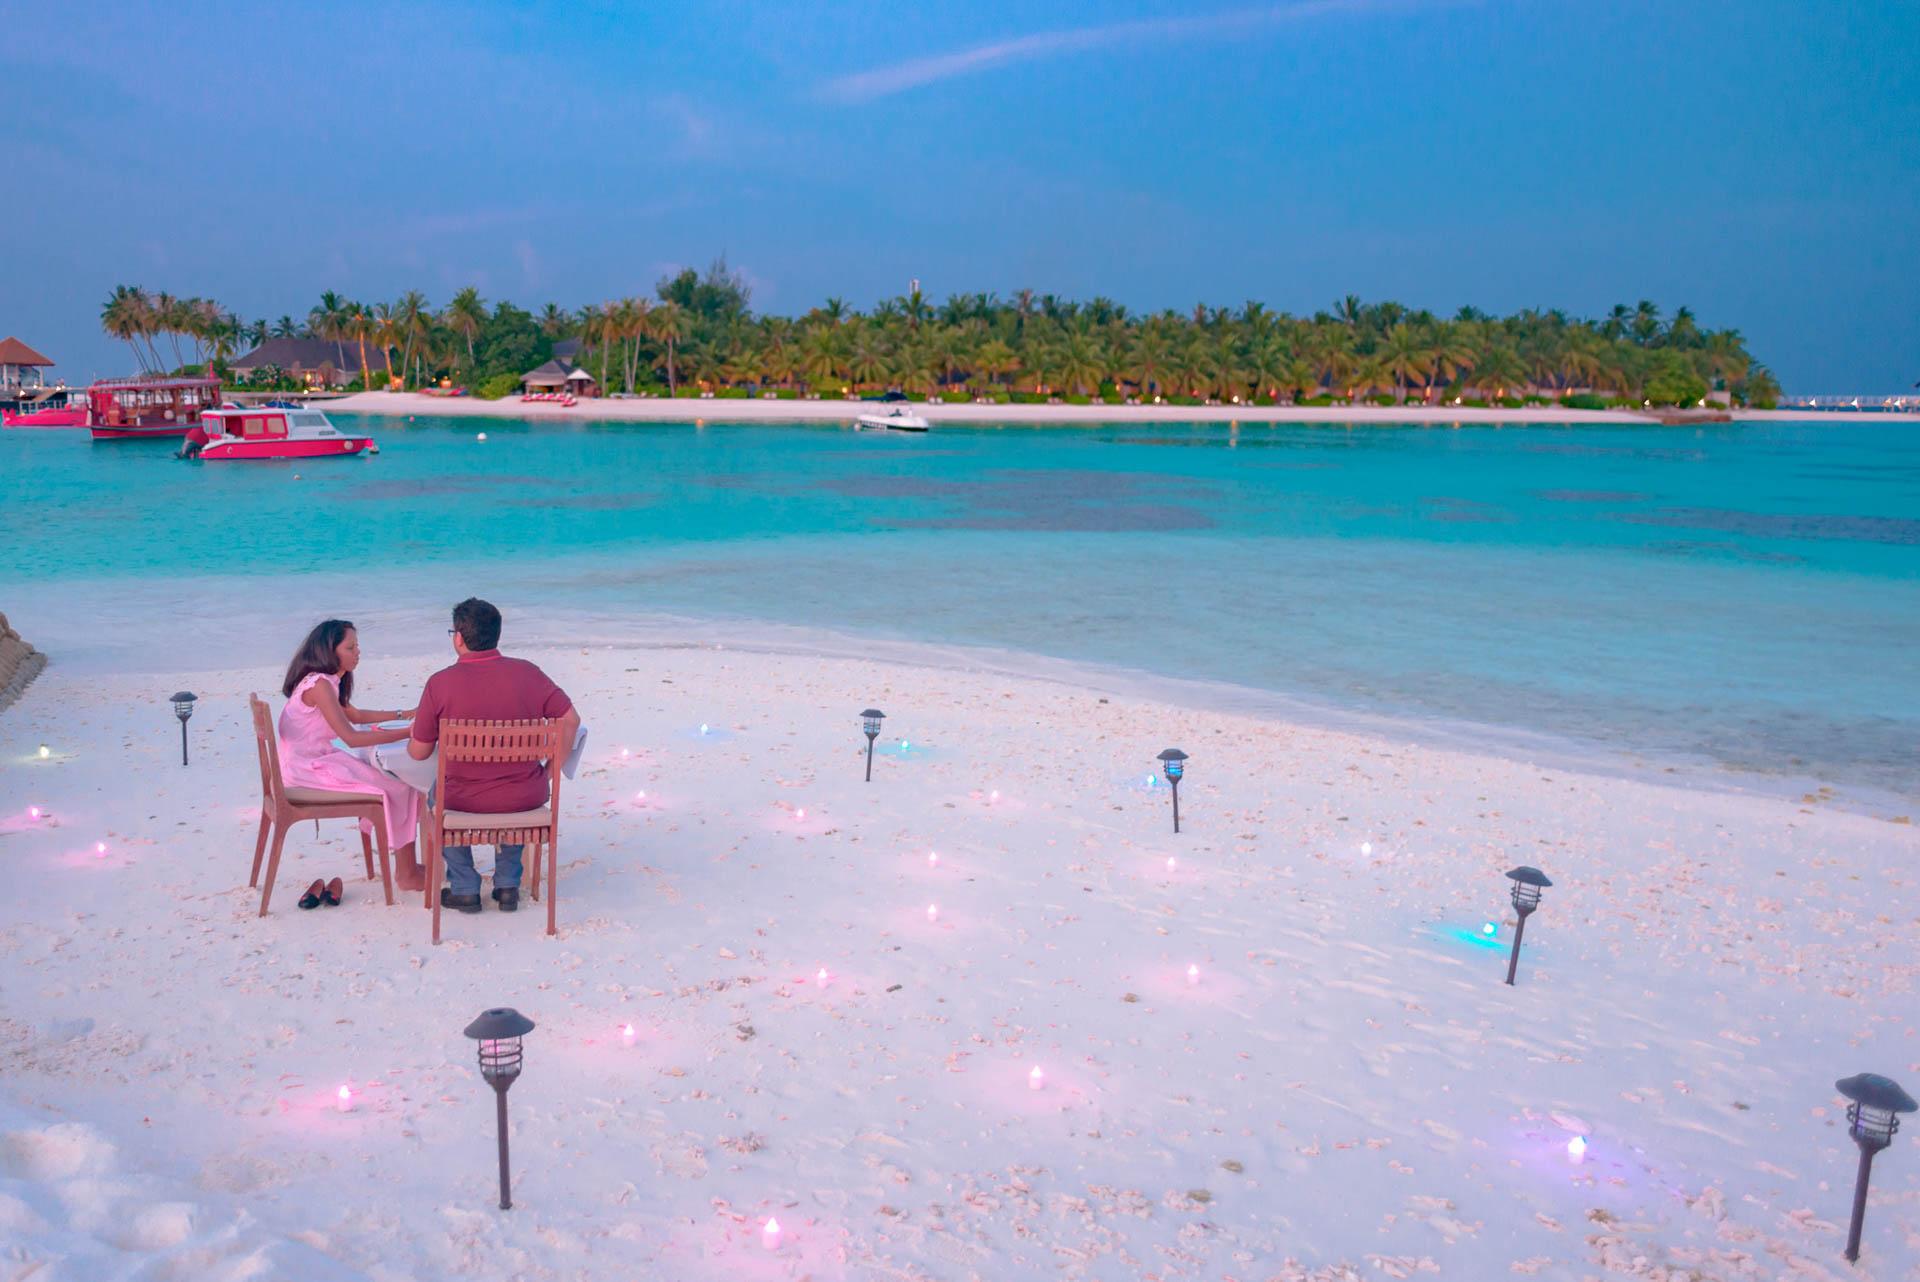 Iyad and Shabneez Honeymoon at Centara Grand 3